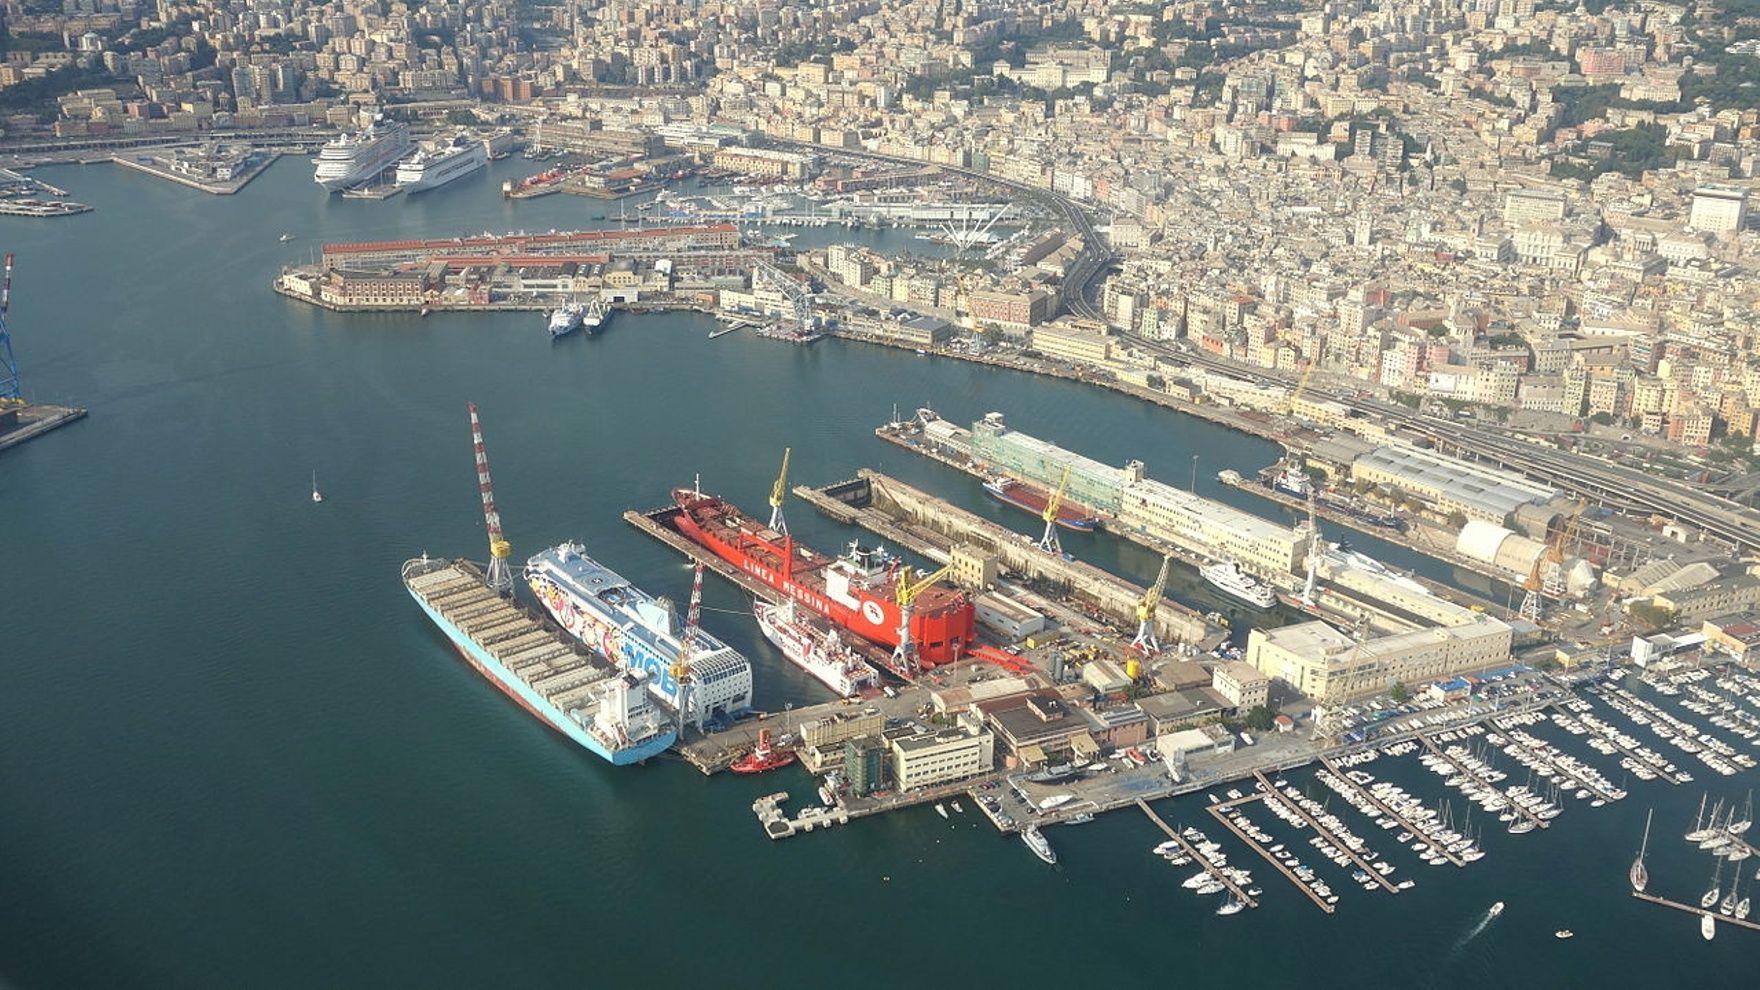 Mile building Genoa - Corfu